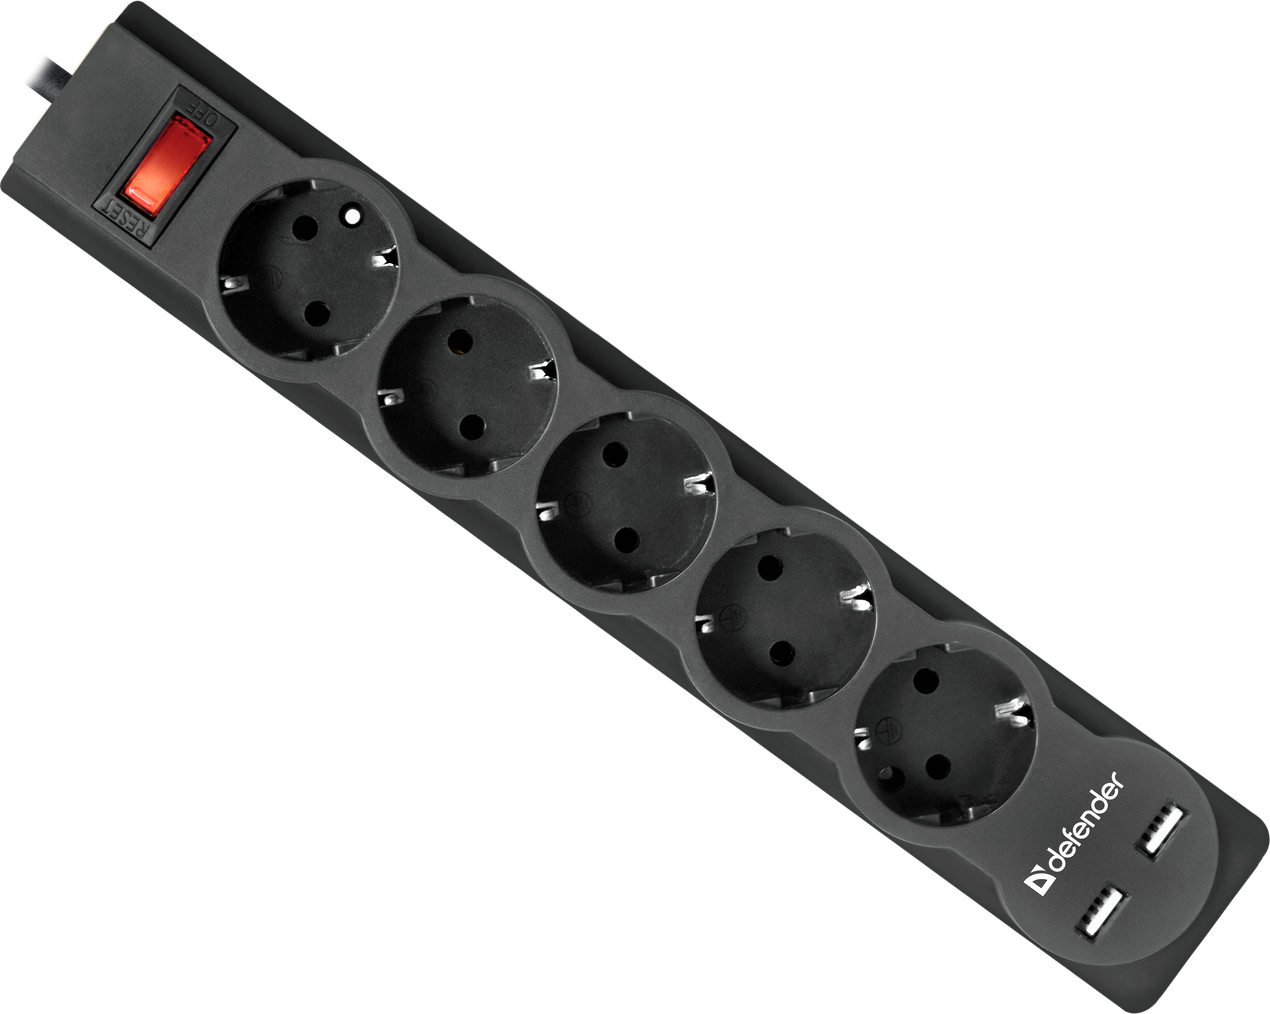 Сетевой фильтр Defender DFS 755 - 5,0 М, 2xUSB, 2.1A, 5 outlets